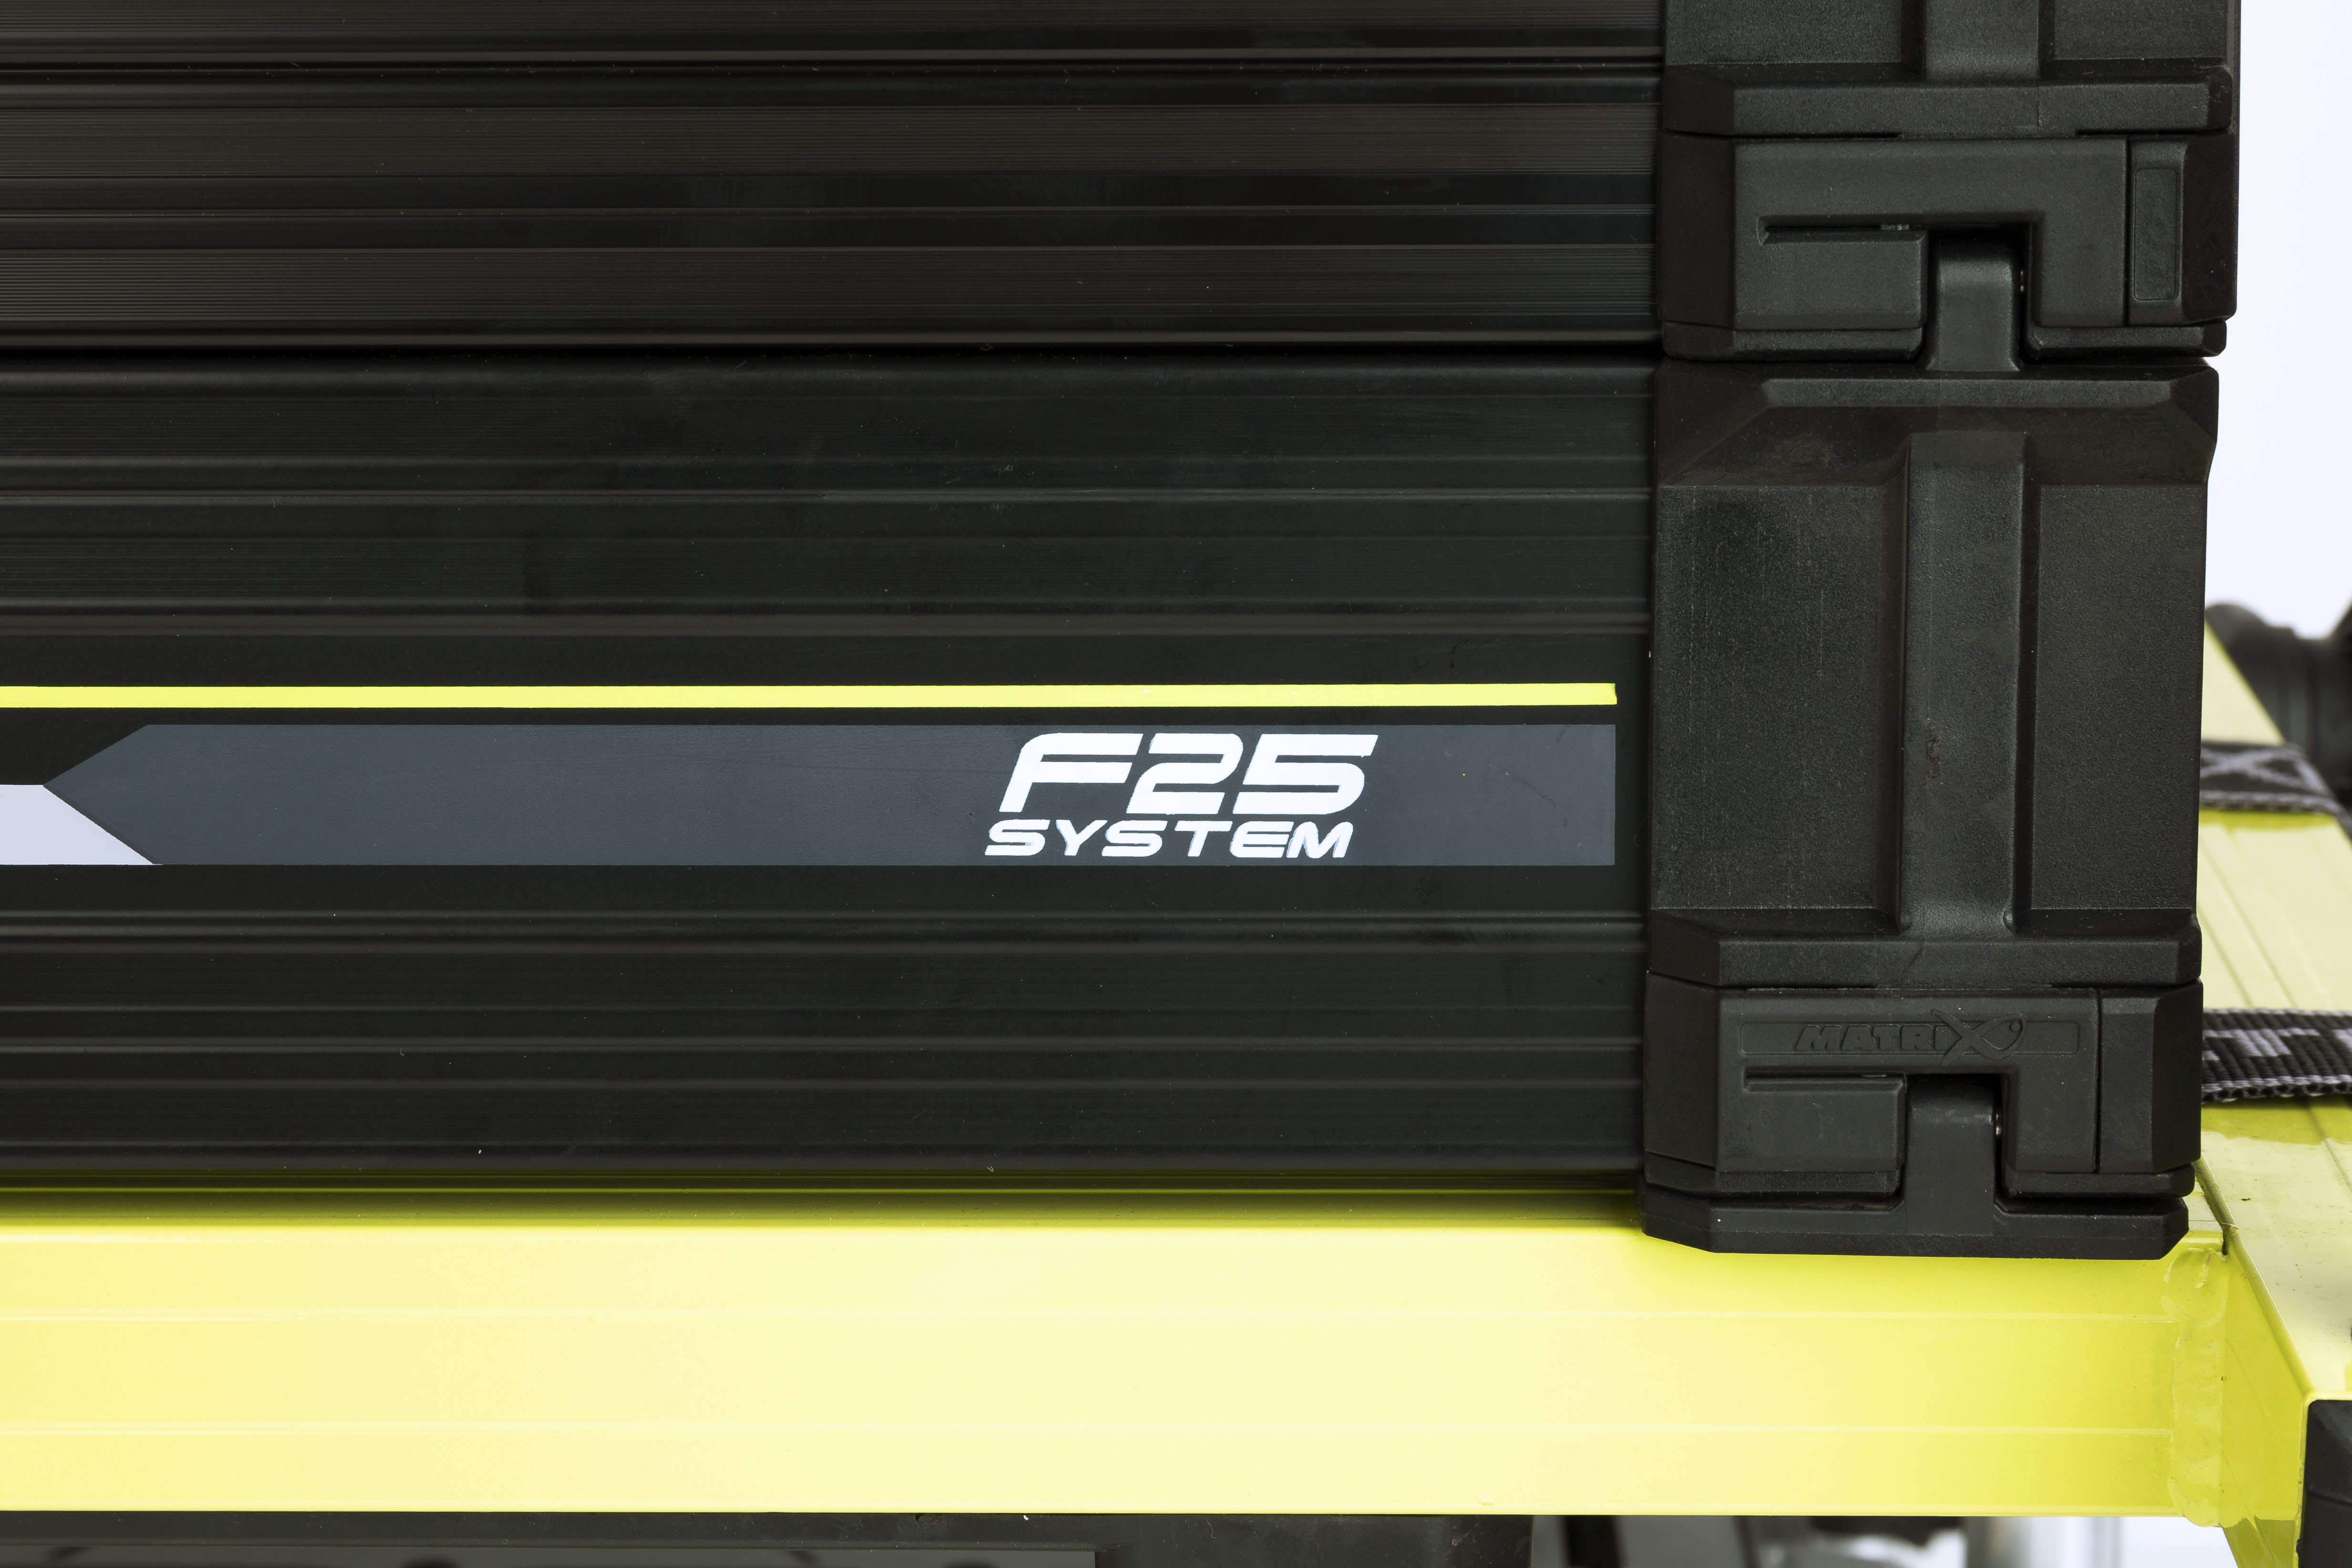 f25-seatbox_cu01jpg